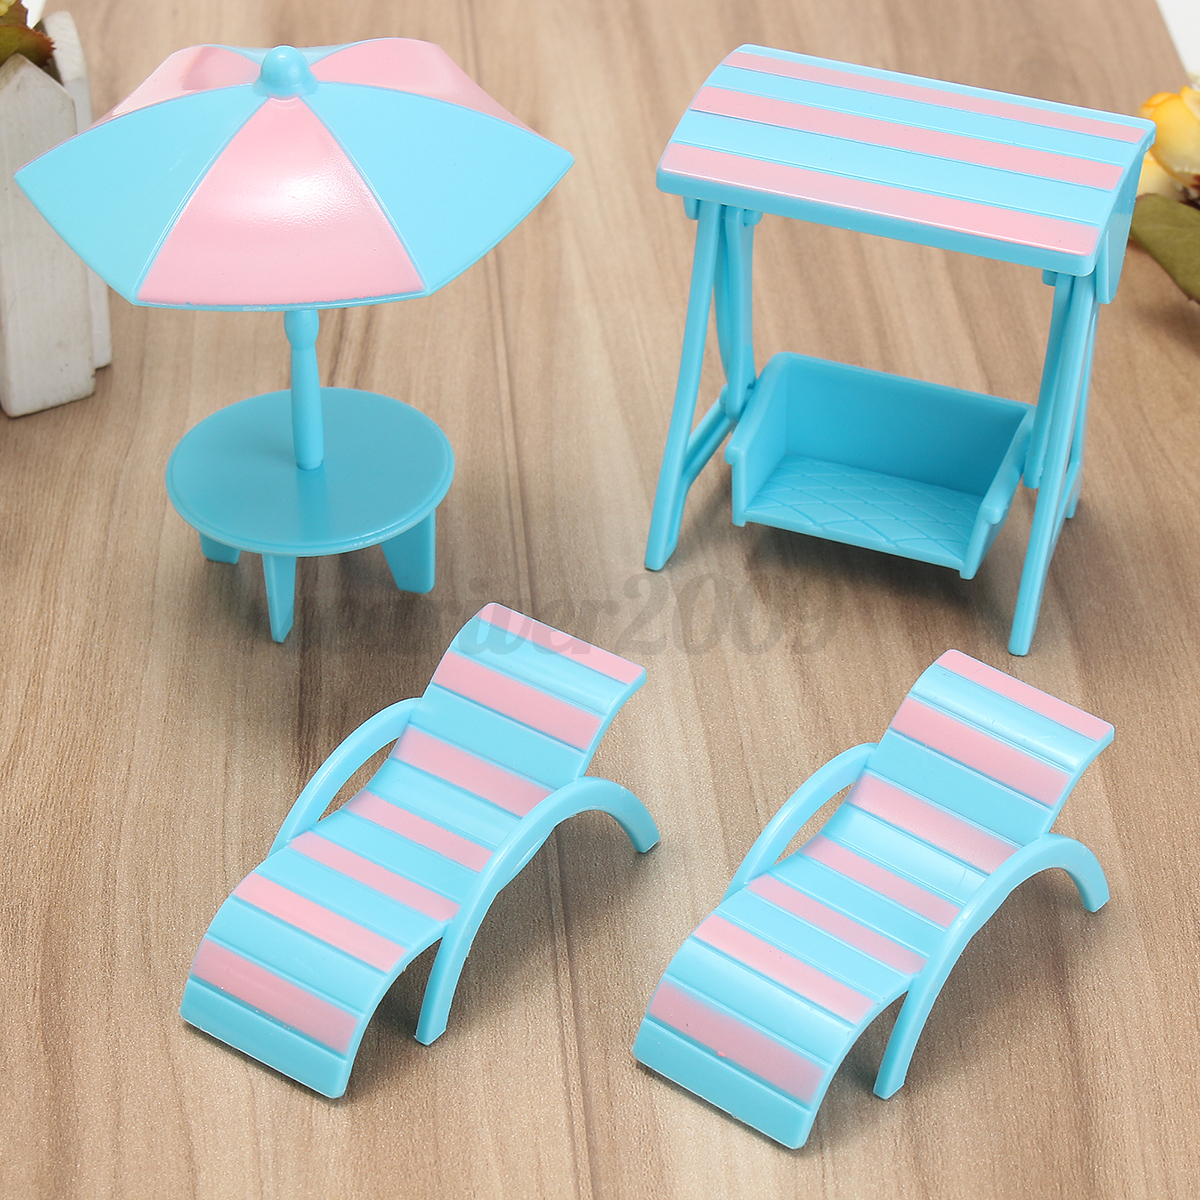 Kaka Pvc Kitchen Furniture: 1/12 Dollhouse Miniature Furniture Plastic Chair Table